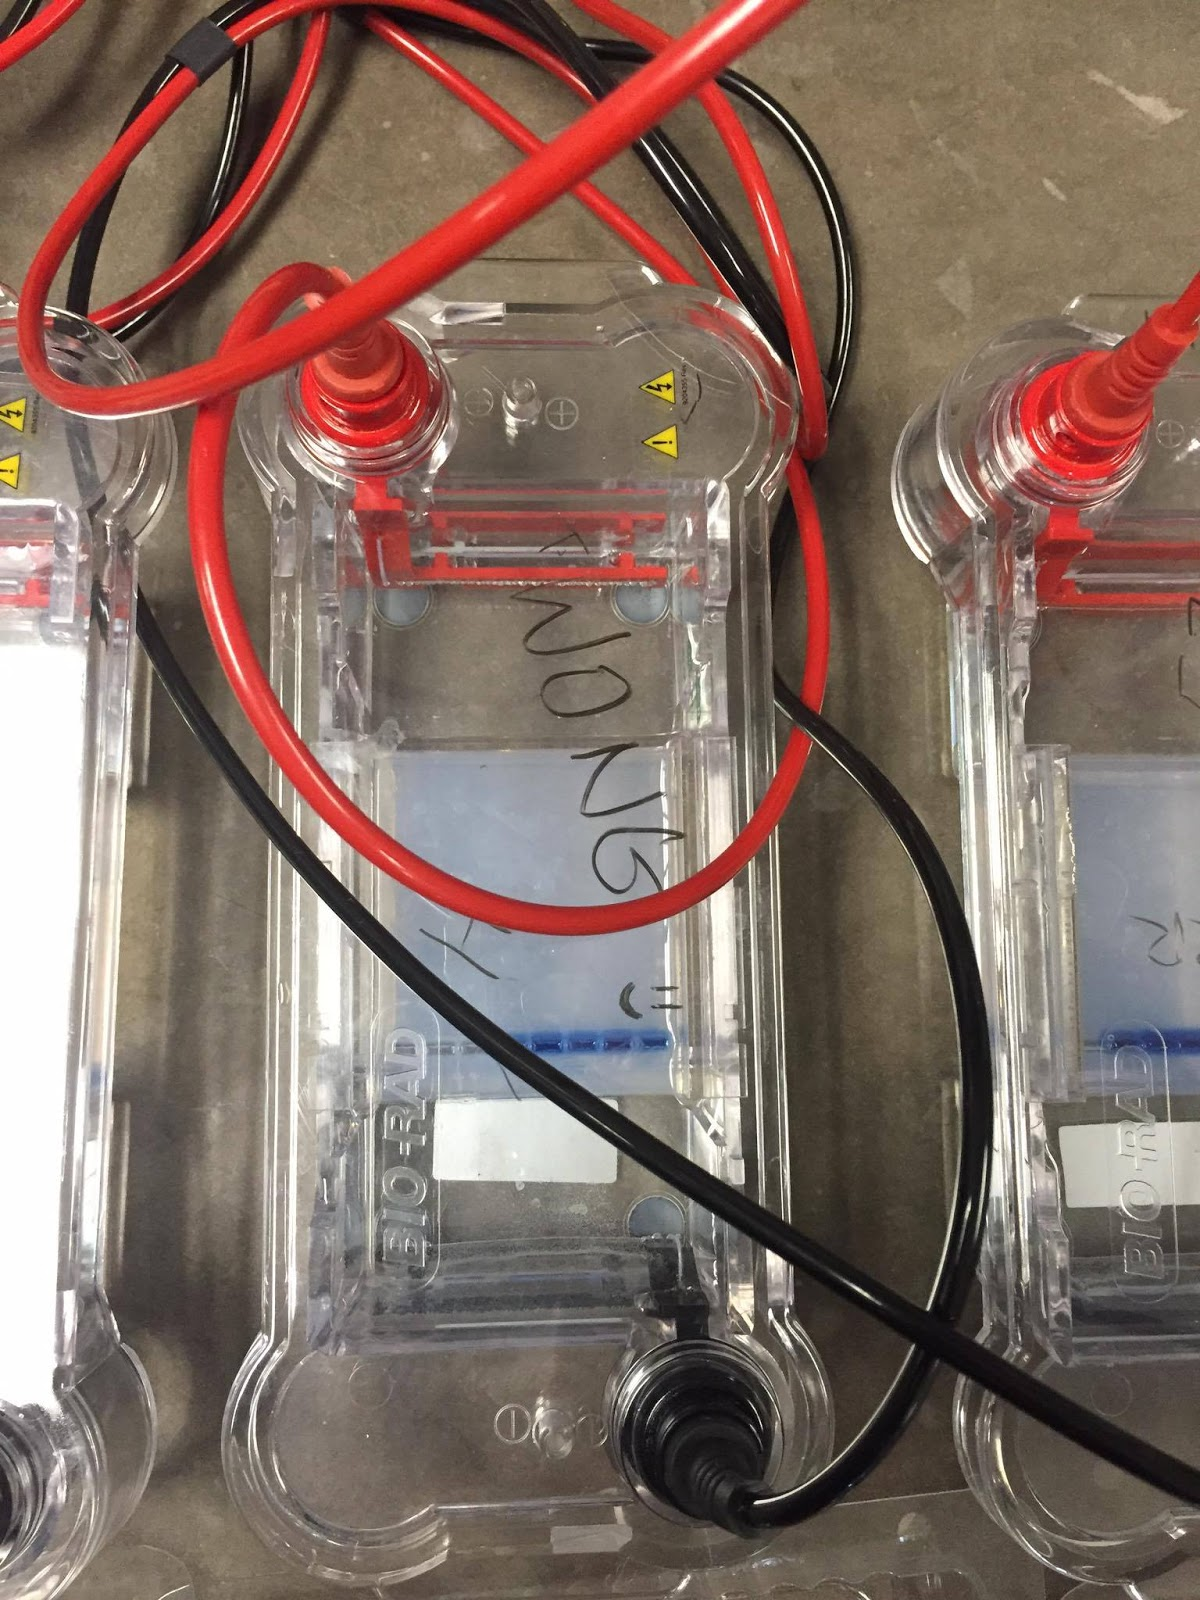 biol 2104 lab report 2 electrophoresis